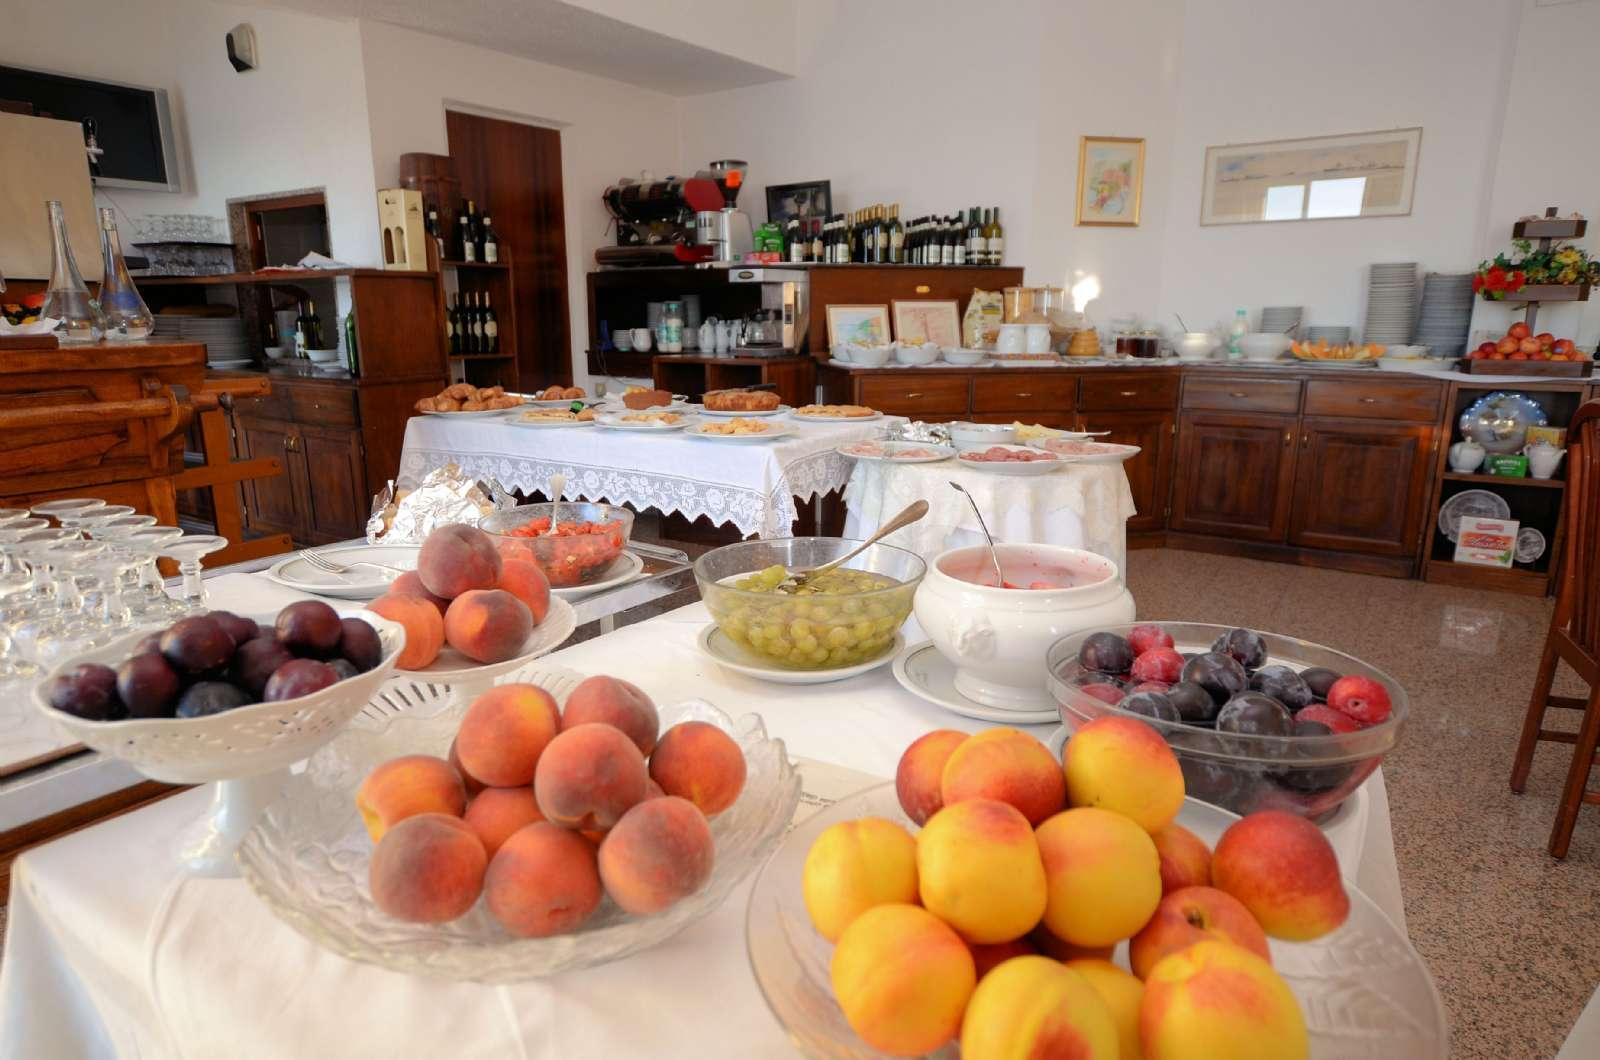 Frühstücksbuffet mit Obst, hausgemachter Kuchen usw.